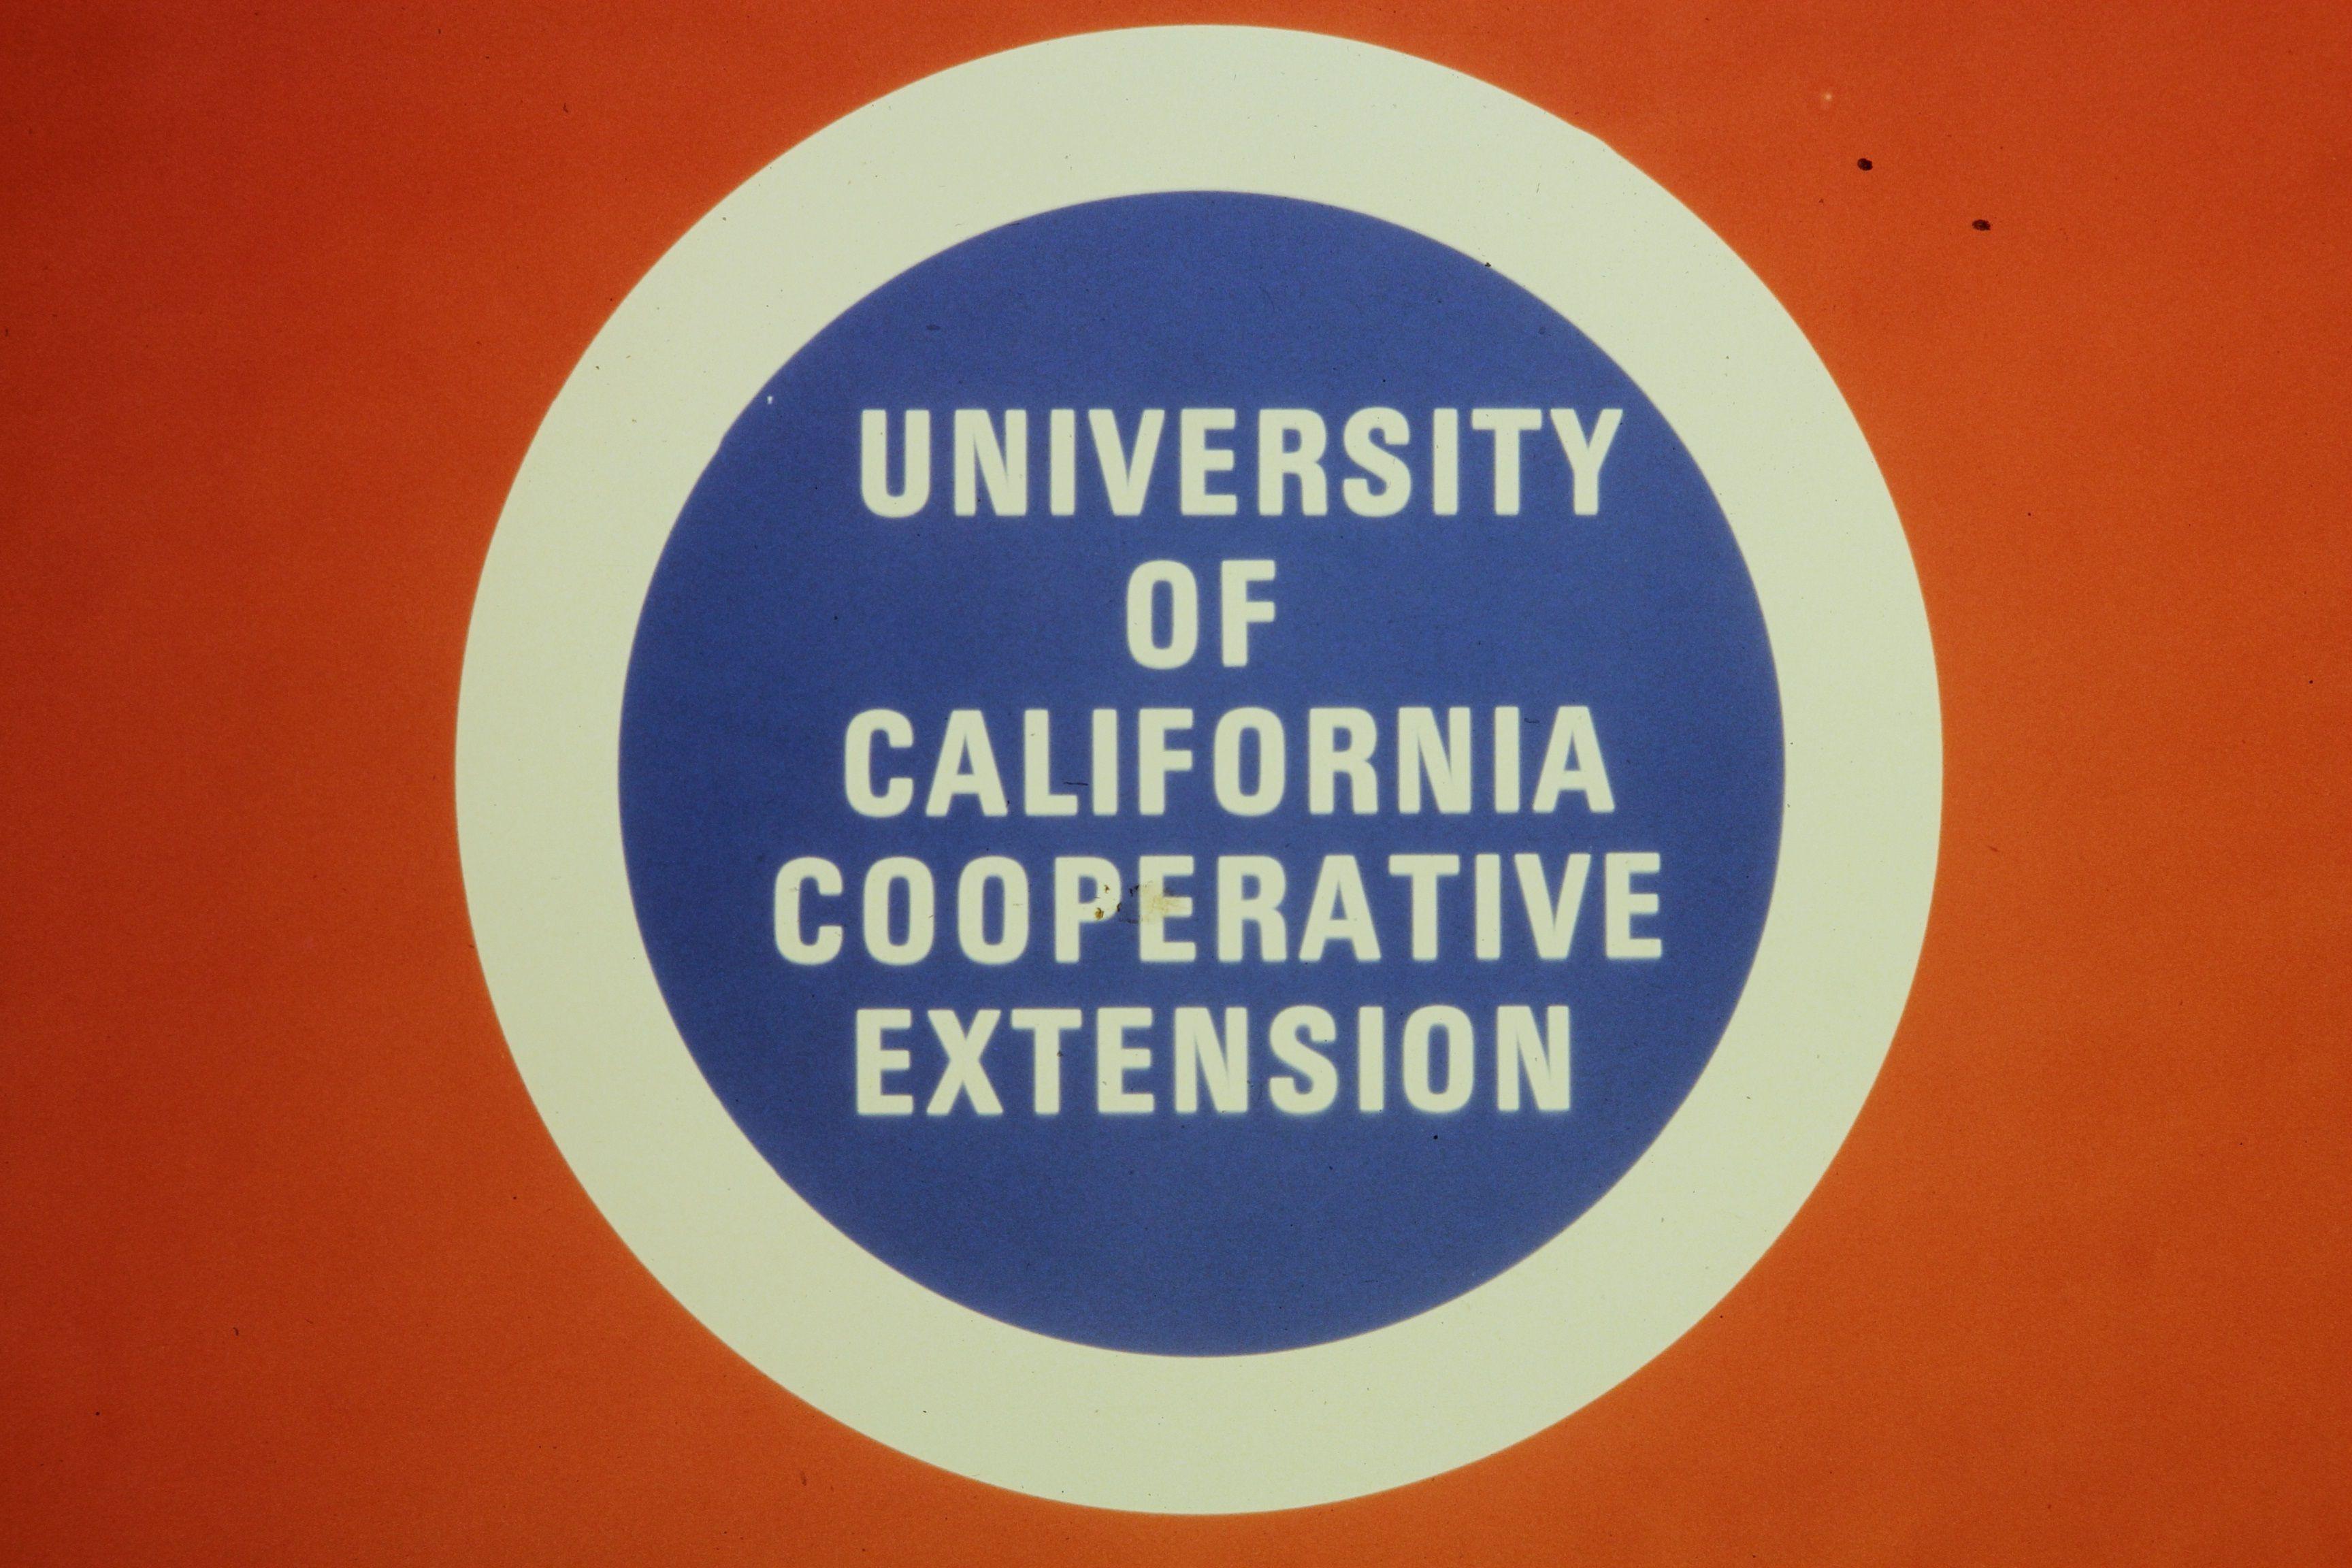 910686c5e813f1fdb3a6713fba17cbb7 - University Of California Master Gardener Program